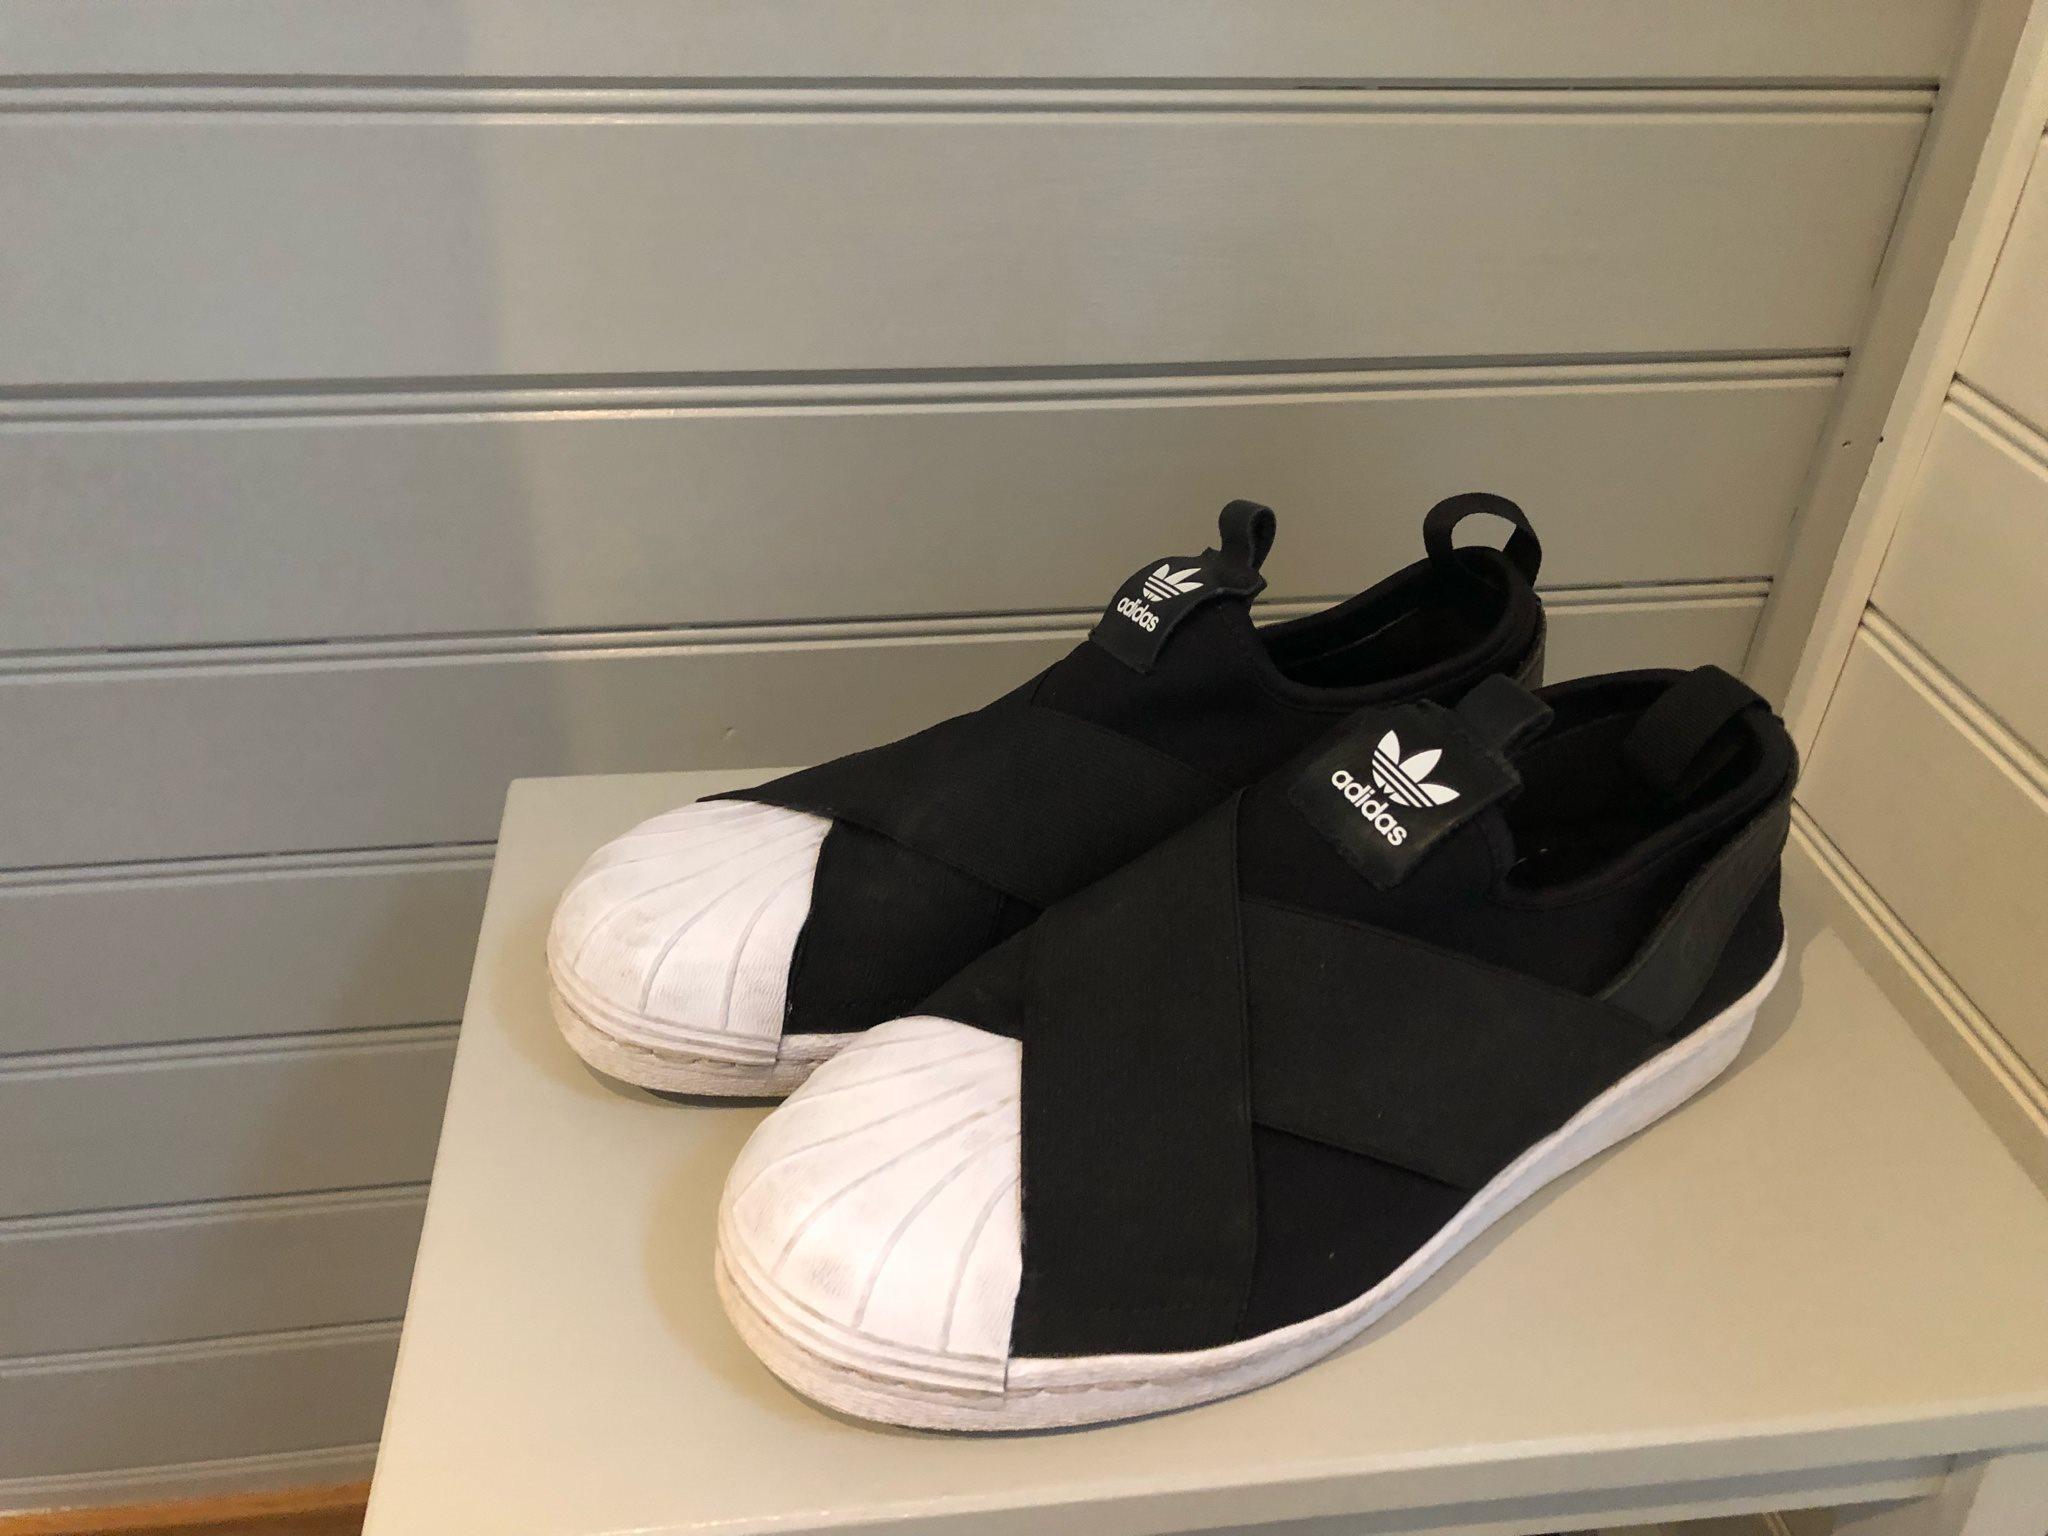 new style db074 cefaf inexpensive adidas superstar storlek 40 d4151 6ddc3